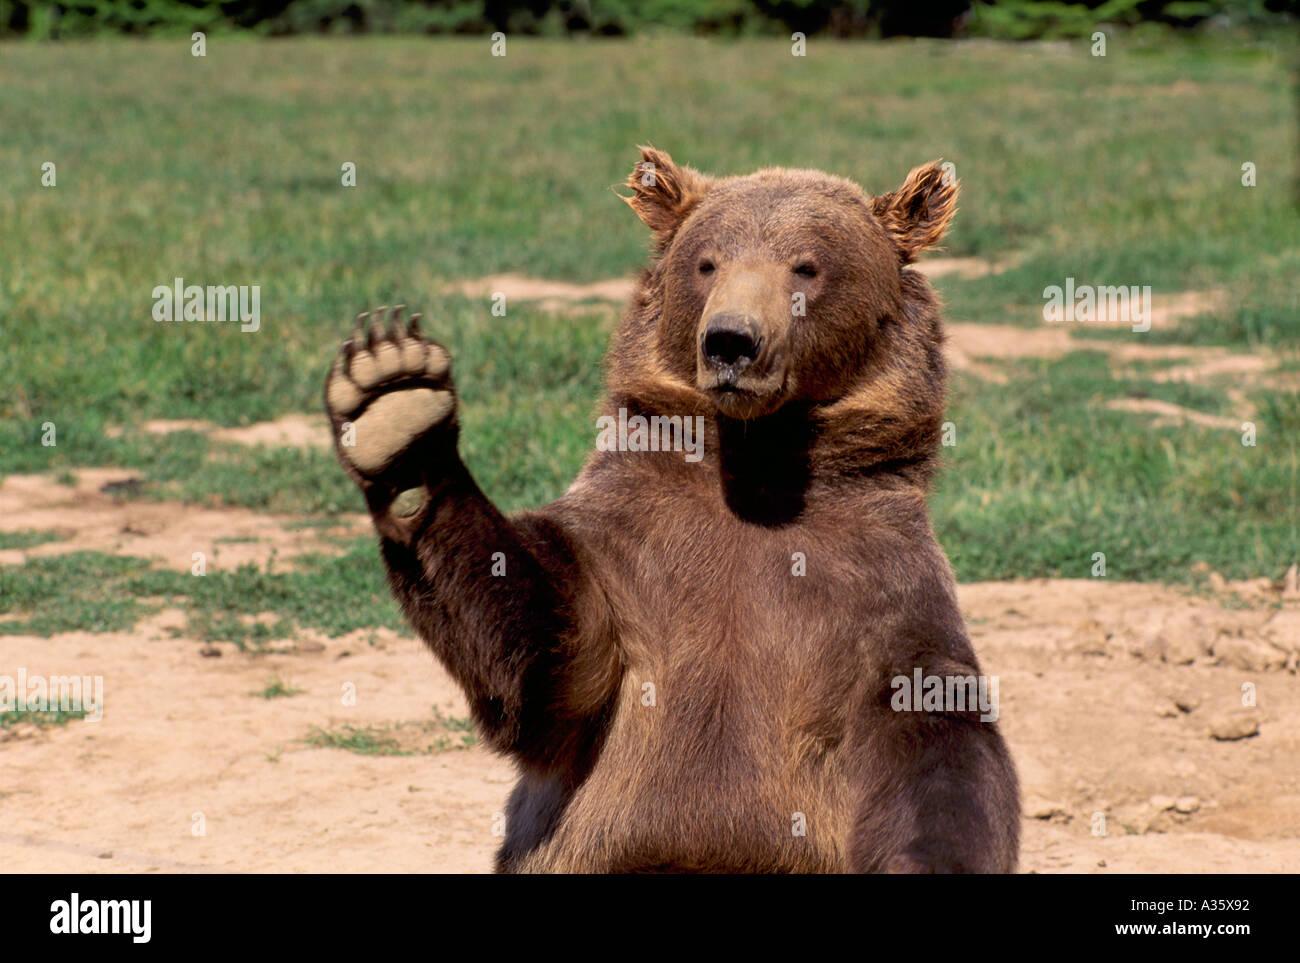 Kodiak Bear aka Alaskan Grizzly Bear and Alaska Brown Bear (Ursus arctos middendorffi) waving a Paw - North American Stock Photo